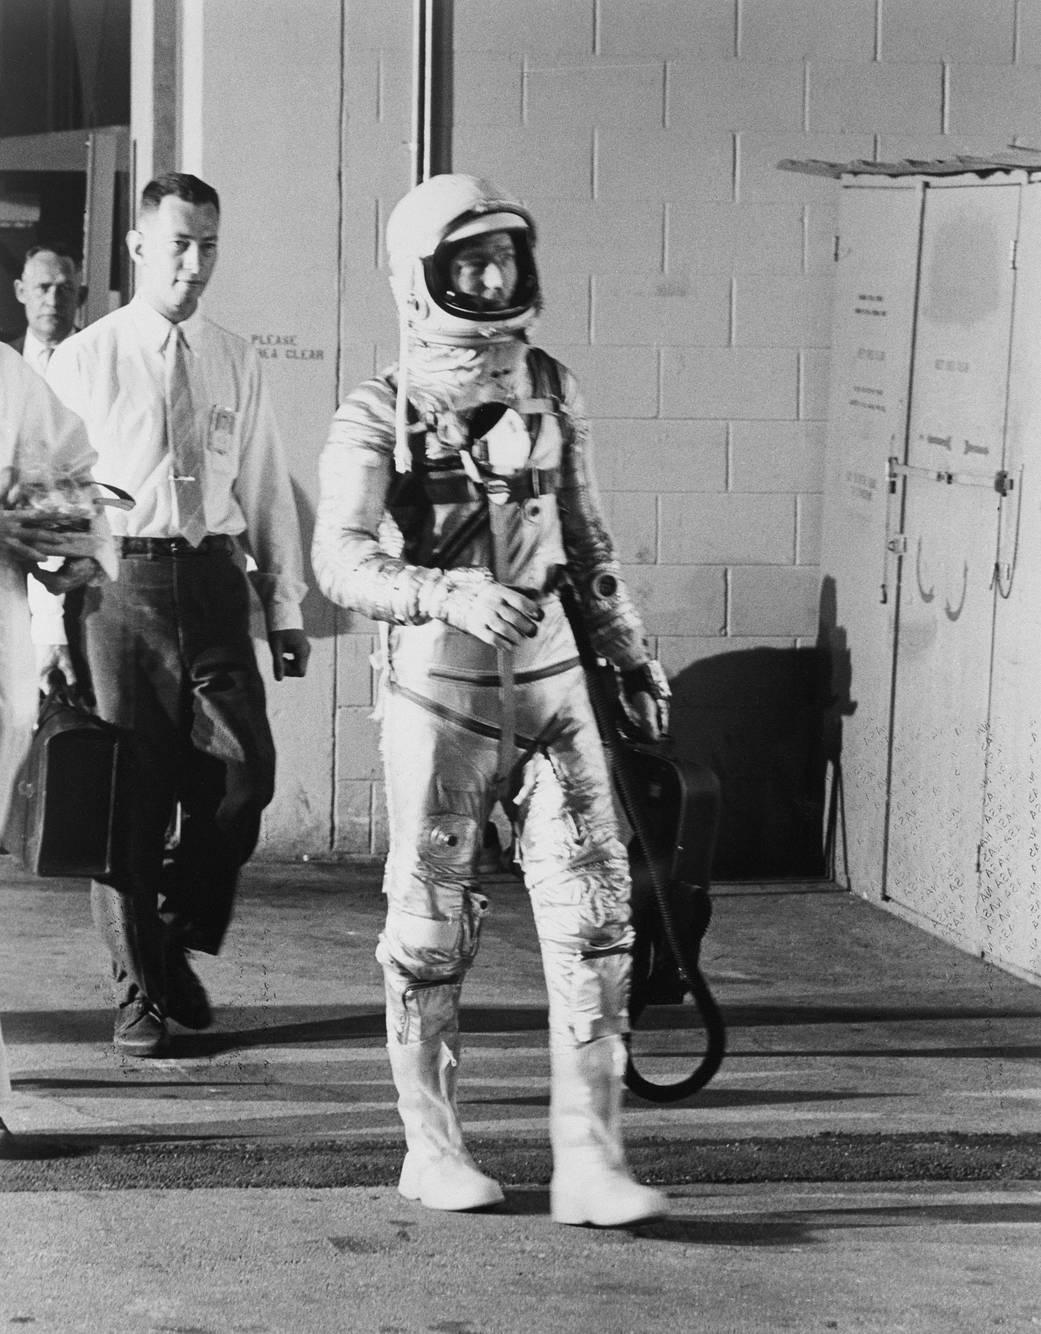 Scott Carpenter in spacesuit walks out of building toward launch site